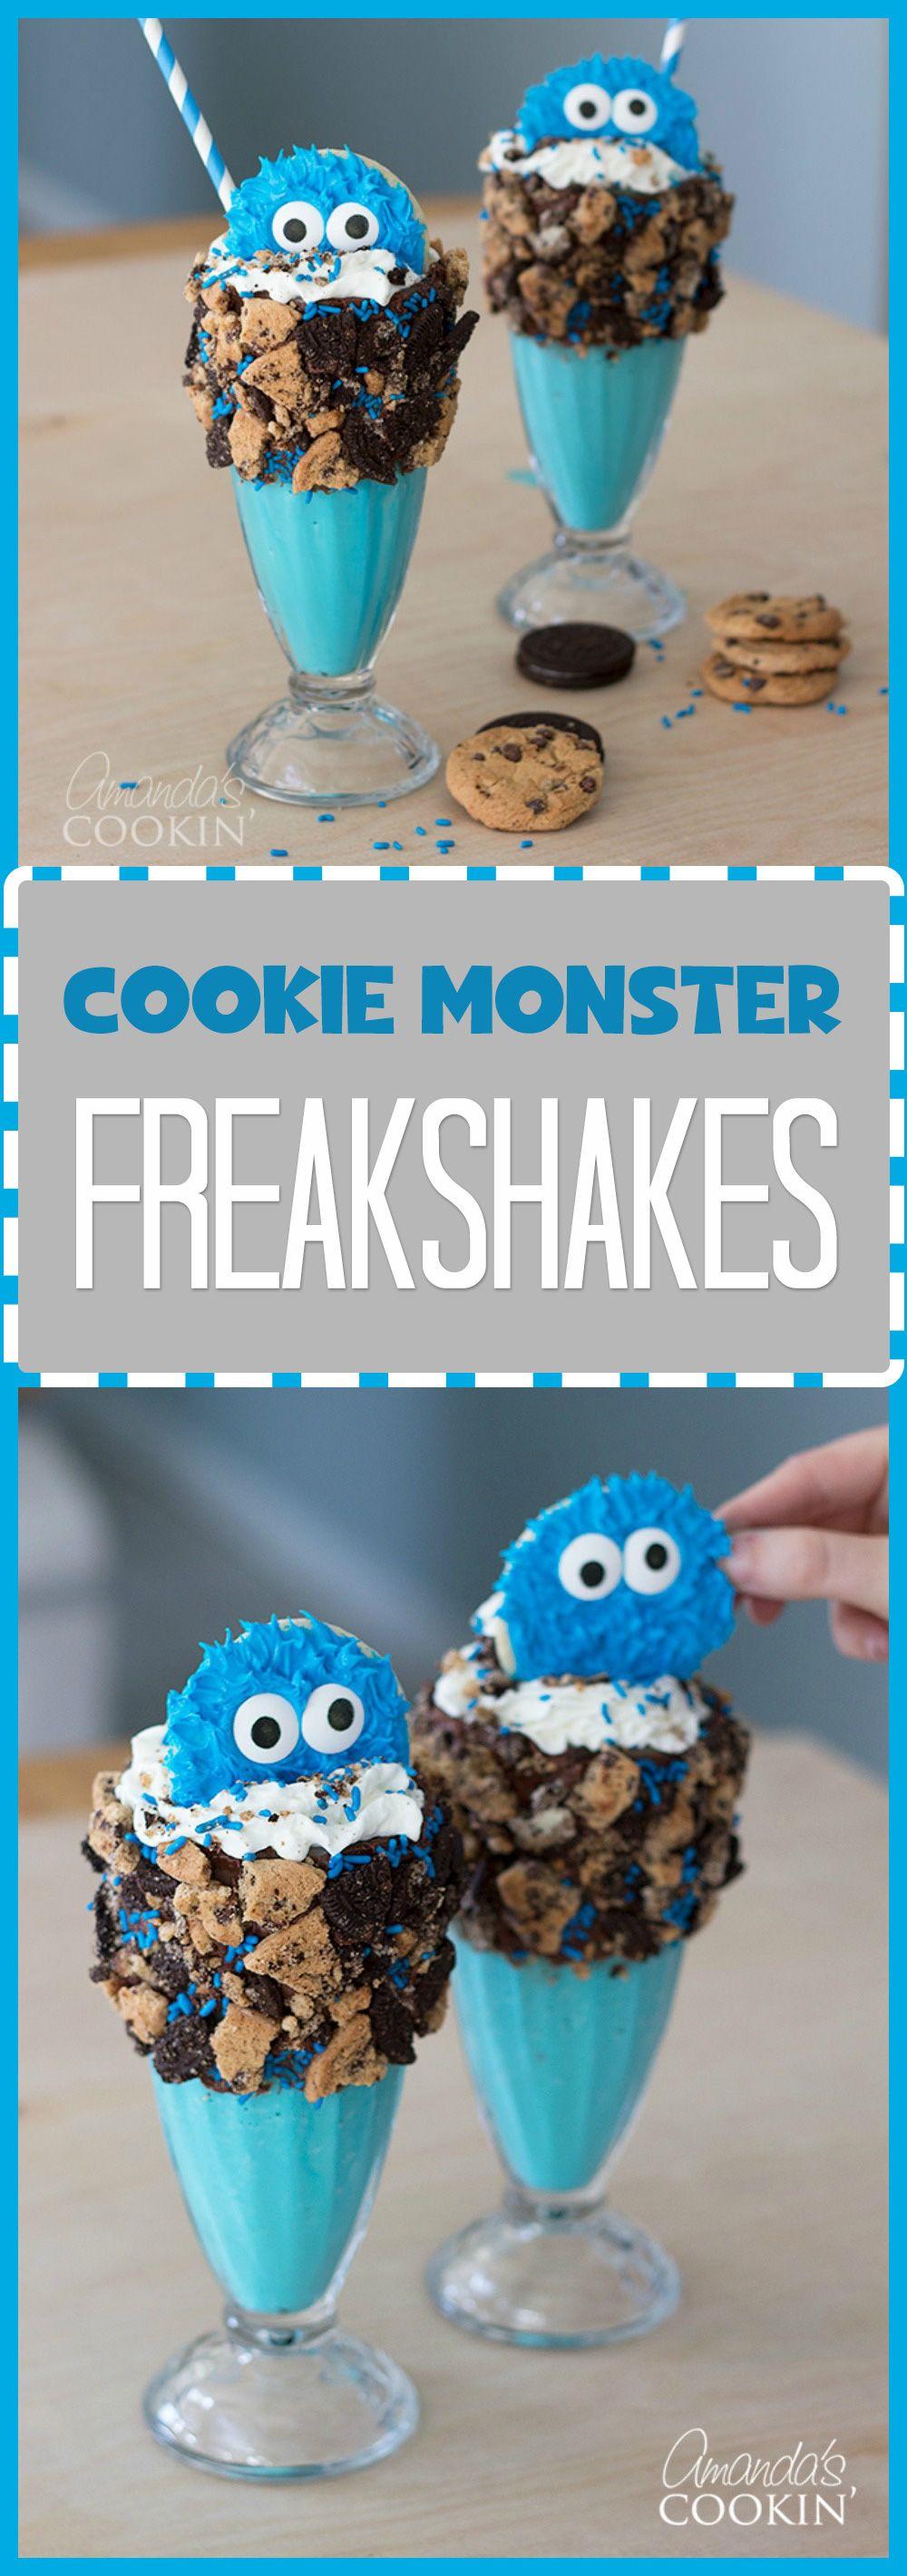 Cookie Monster Freak Shakes: an adorably extreme milkshake!